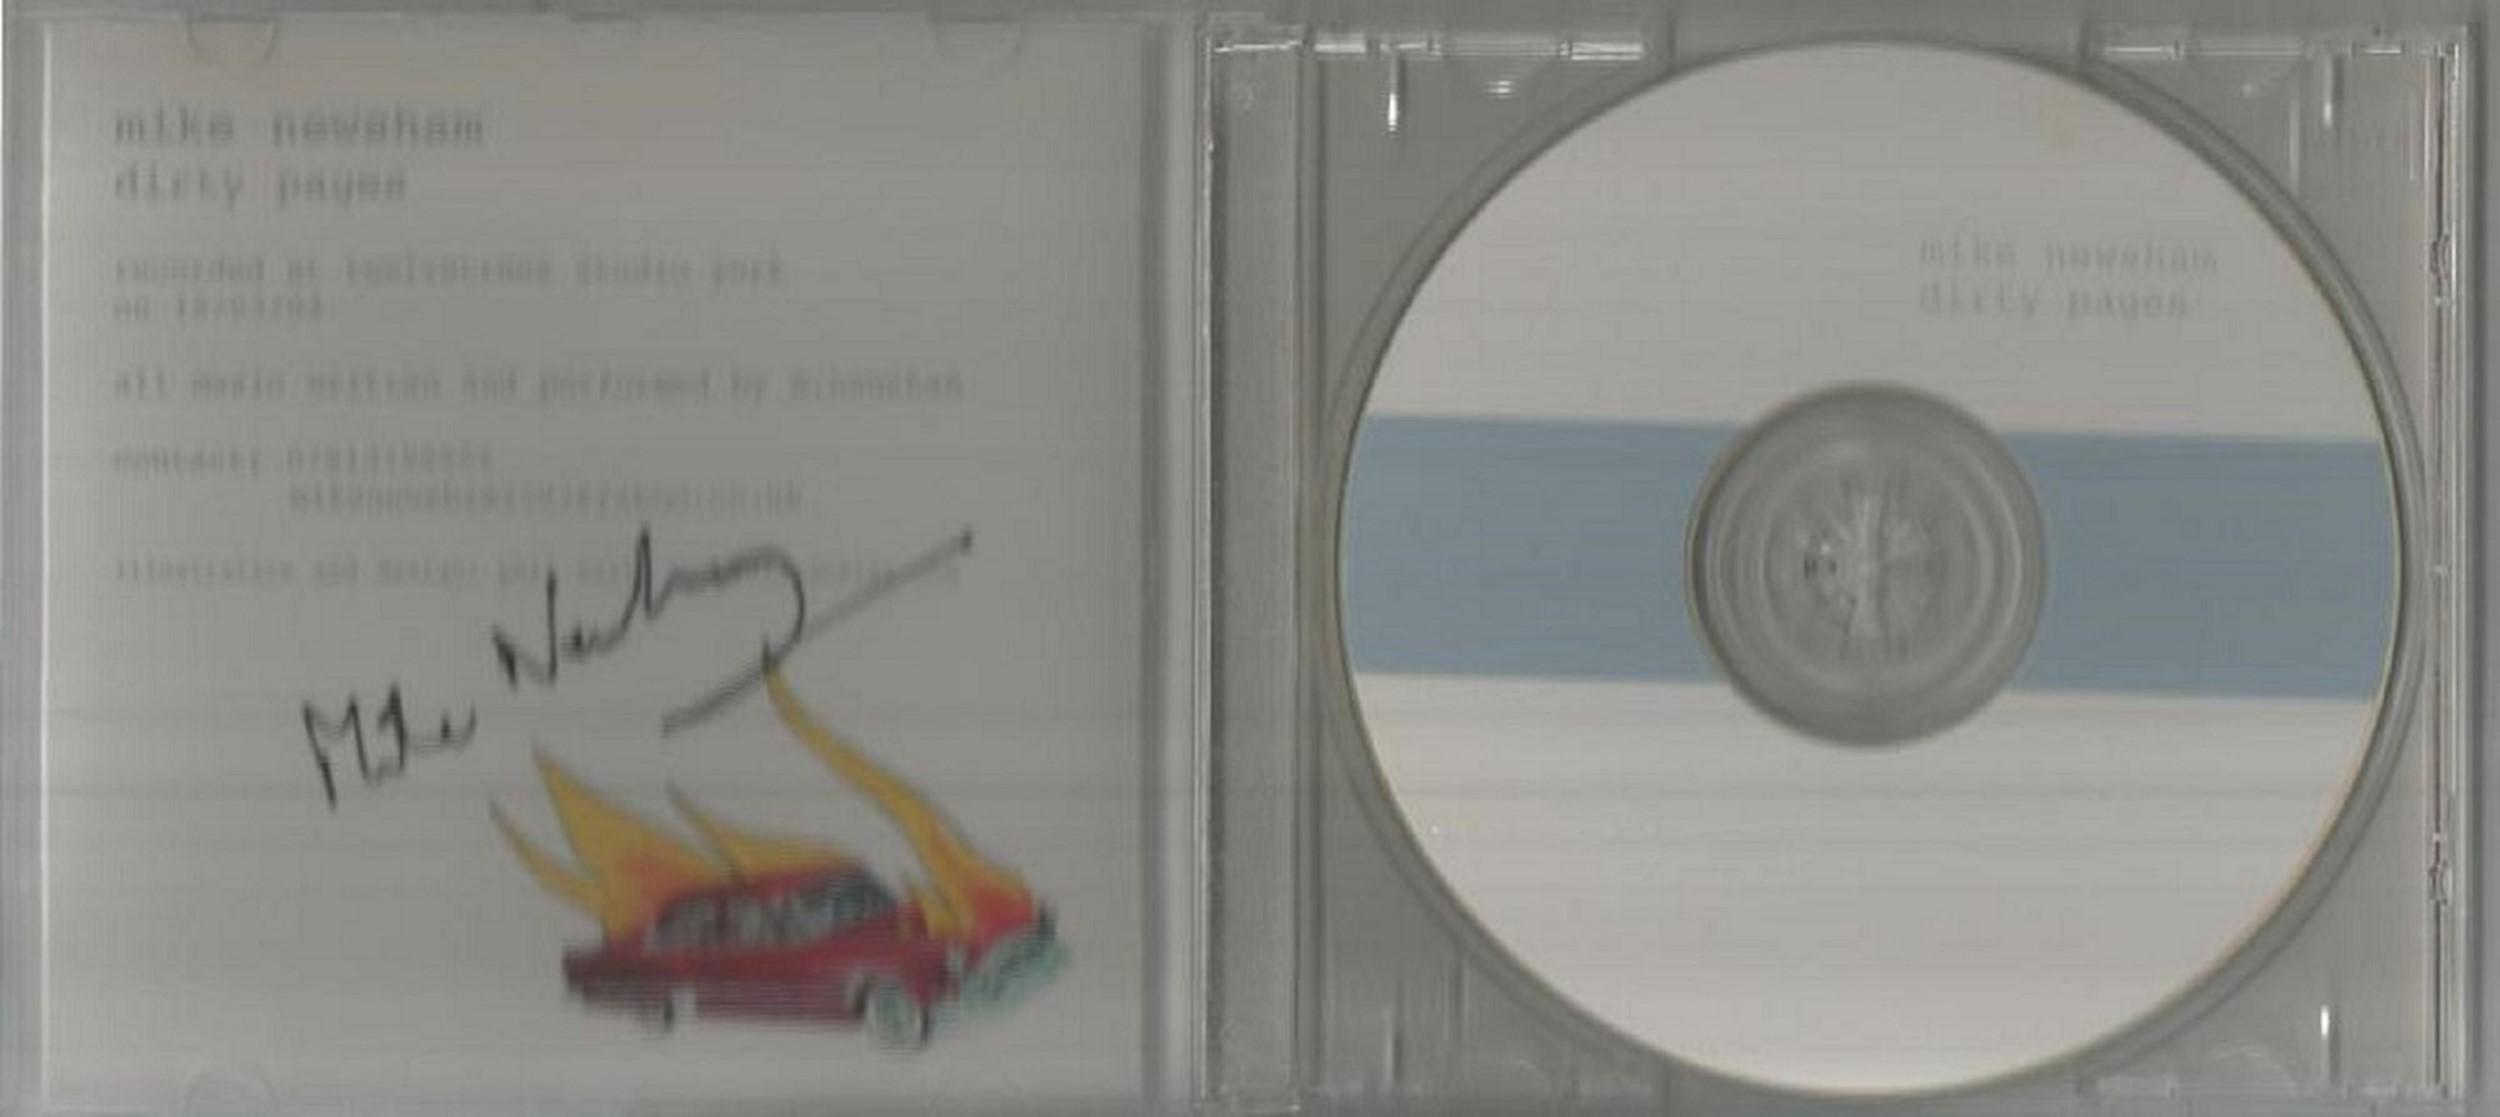 6 Signed CDs Including Joseph L Garlington Joy Disc Included, Compilation Golden Italian Hits Disc - Image 4 of 5